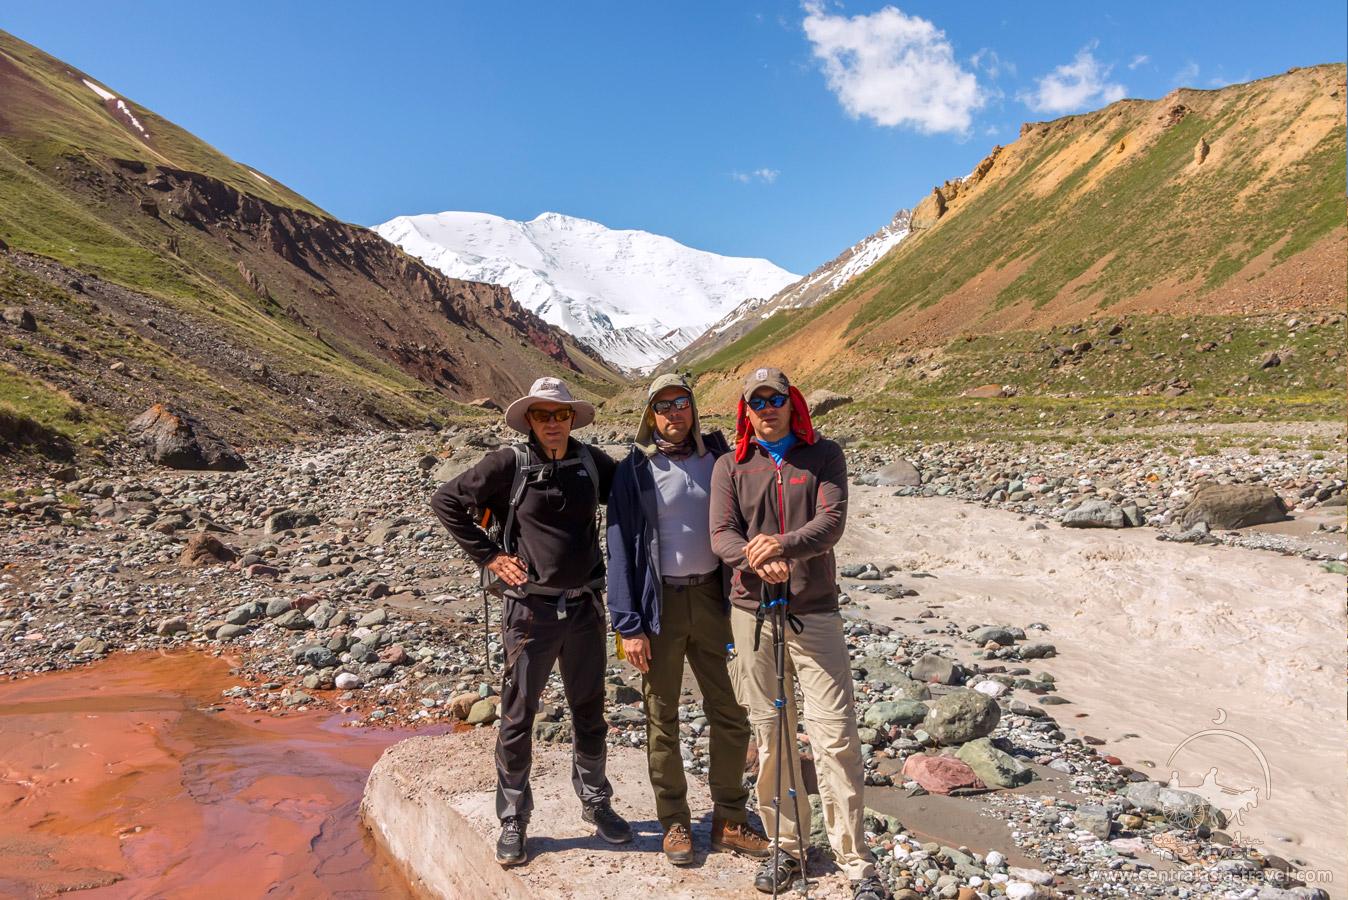 Umgebung des Basislagers (3600 m)